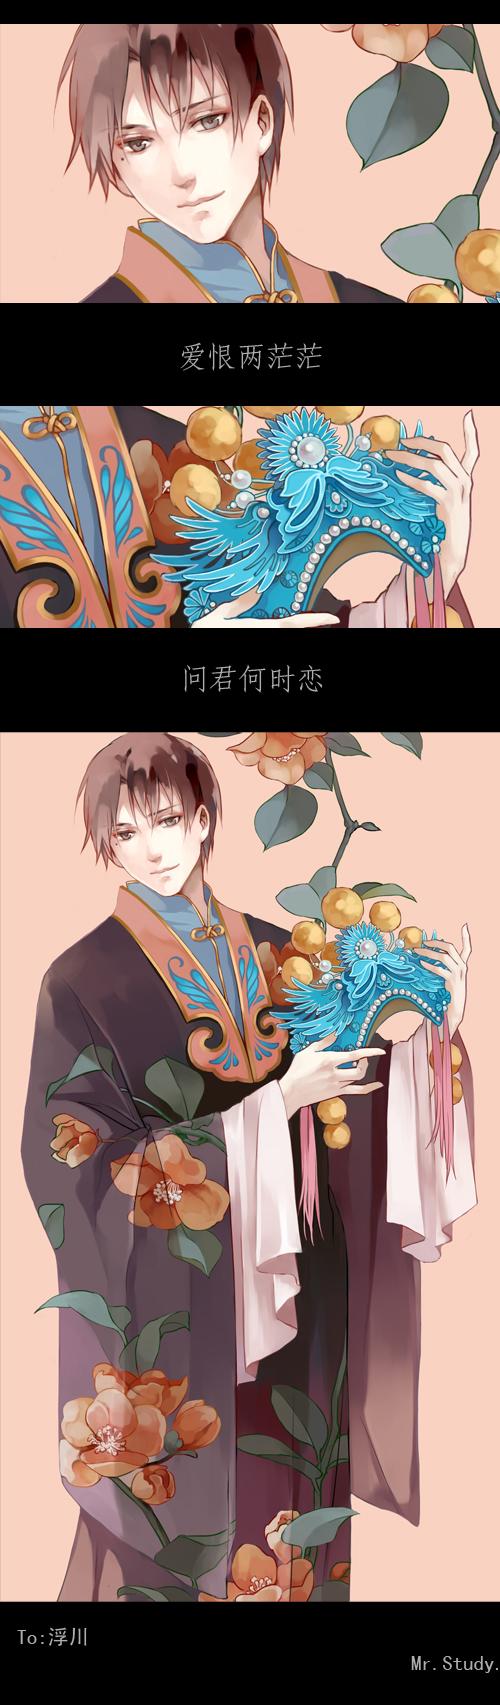 Tags: Anime, Pixiv Id 1547007, Daomu, Wu Xie, Pixiv